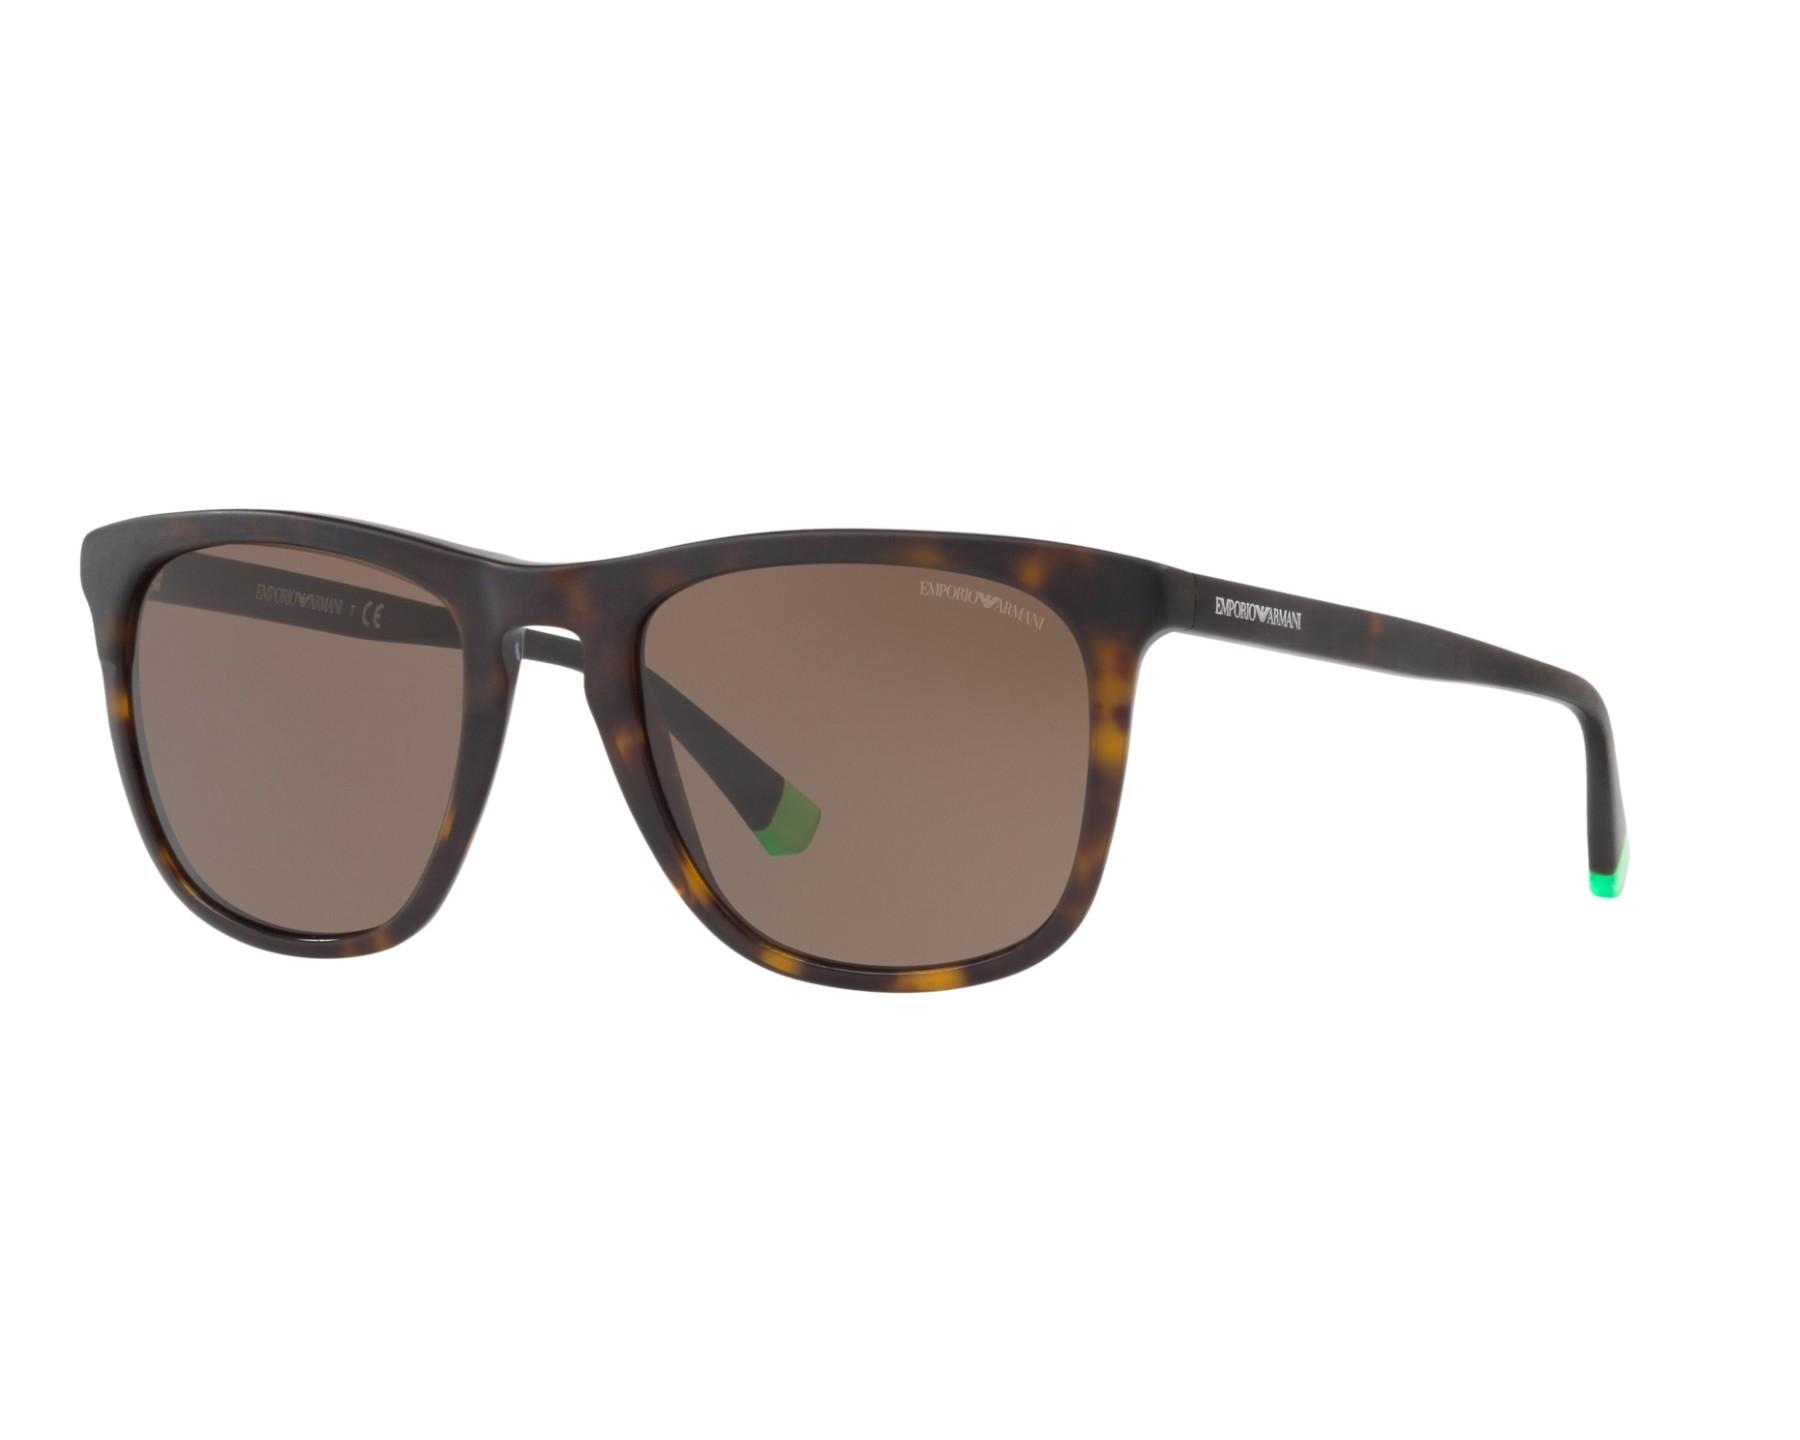 Emporio Armani EA4105 Sonnenbrille Mattgrün 55976R 53mm J3THJtle